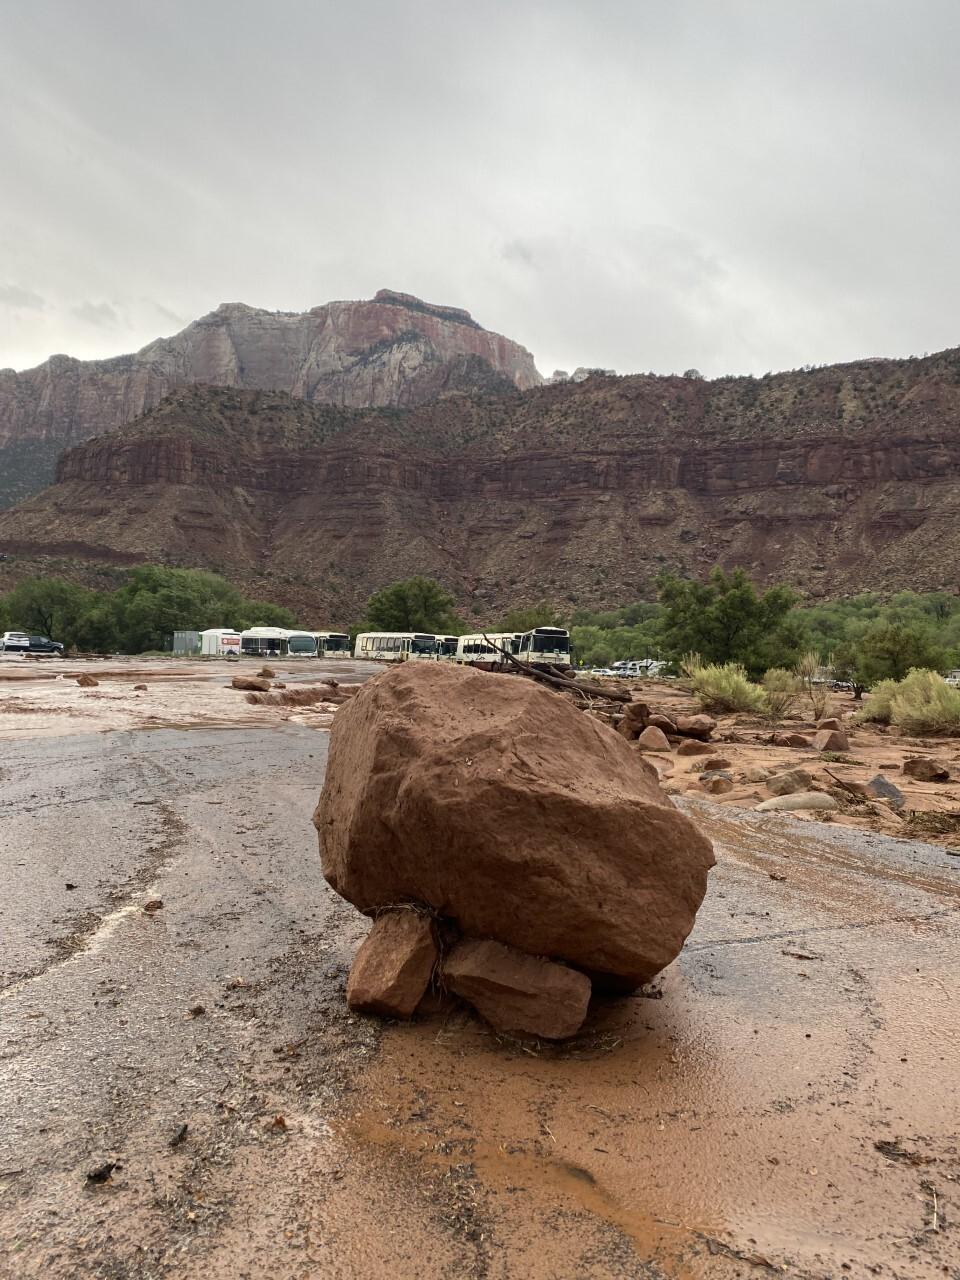 Zion National Park_rock in parking lot_6_29_2021.jpg